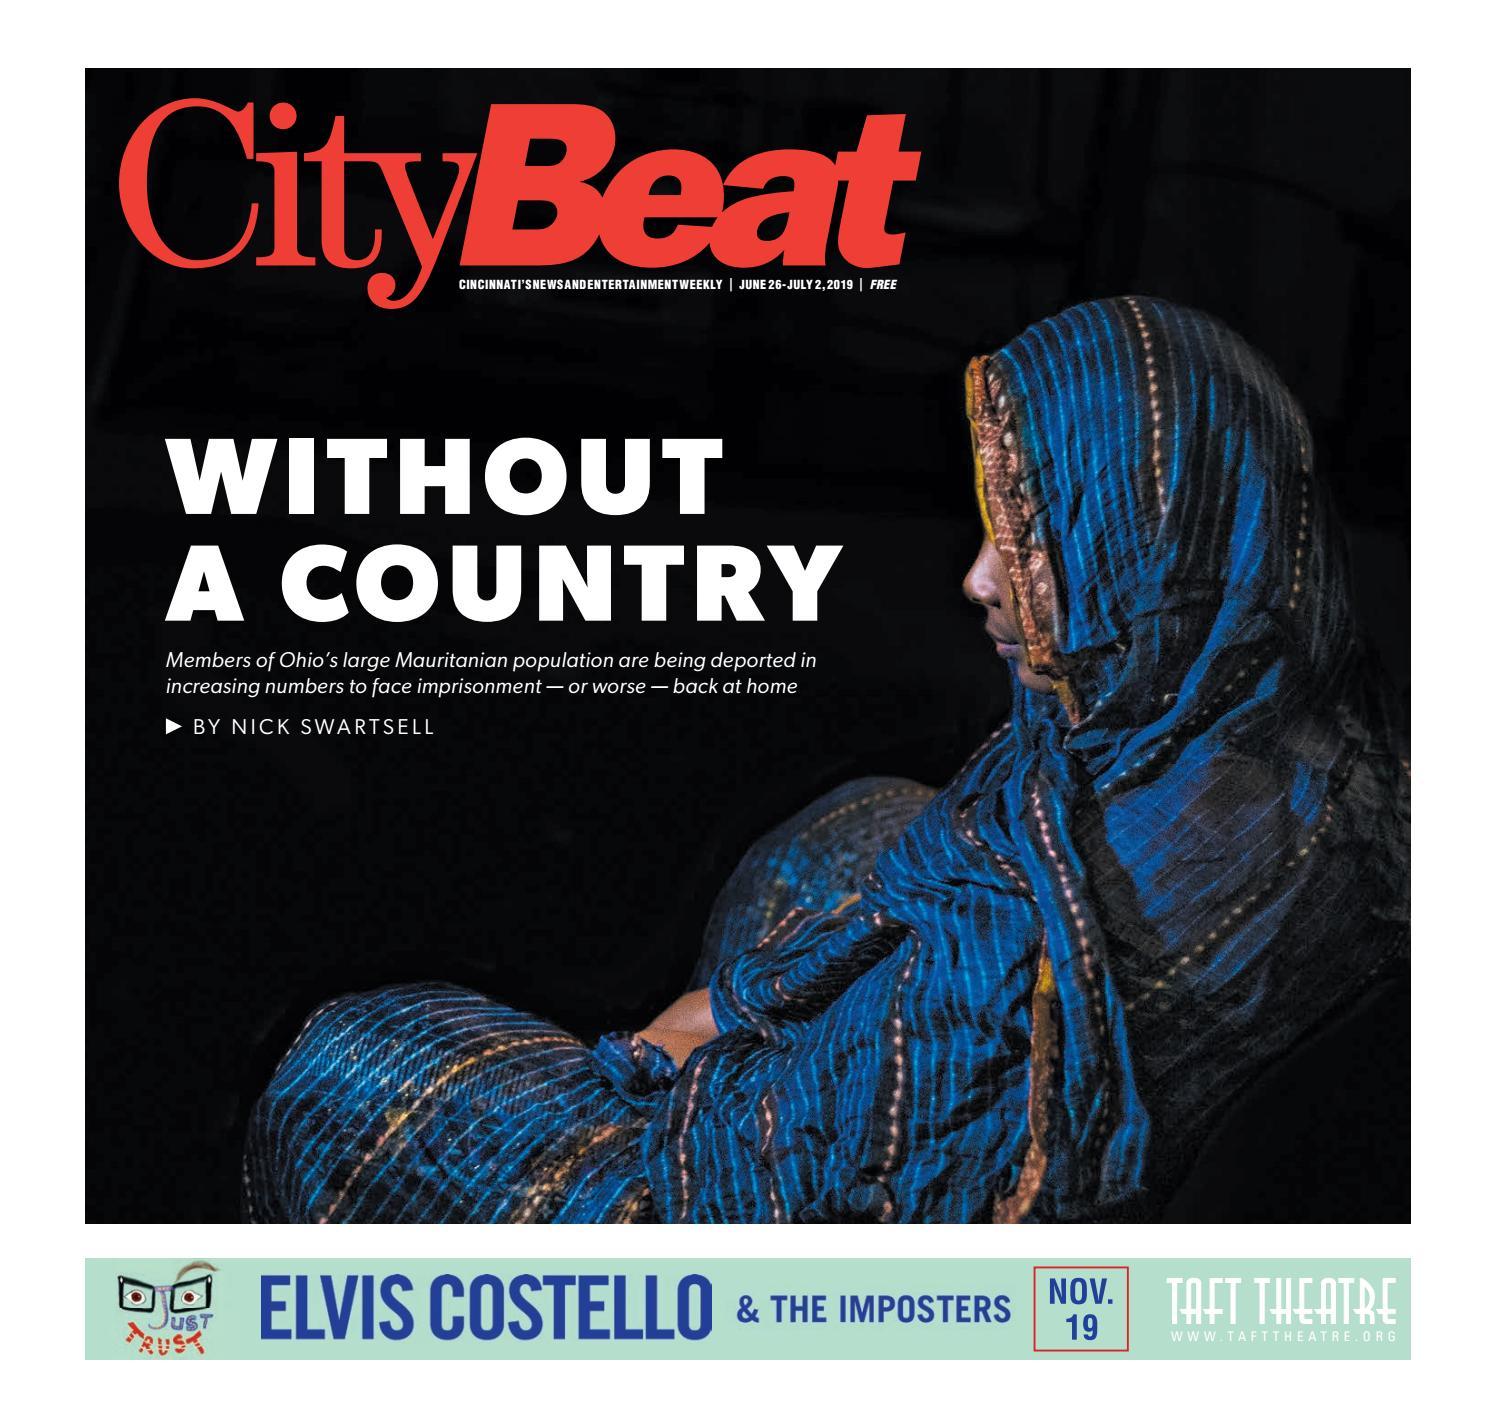 1e94bab8732 CityBeat | June 26, 2019 by Euclid Media Group - issuu